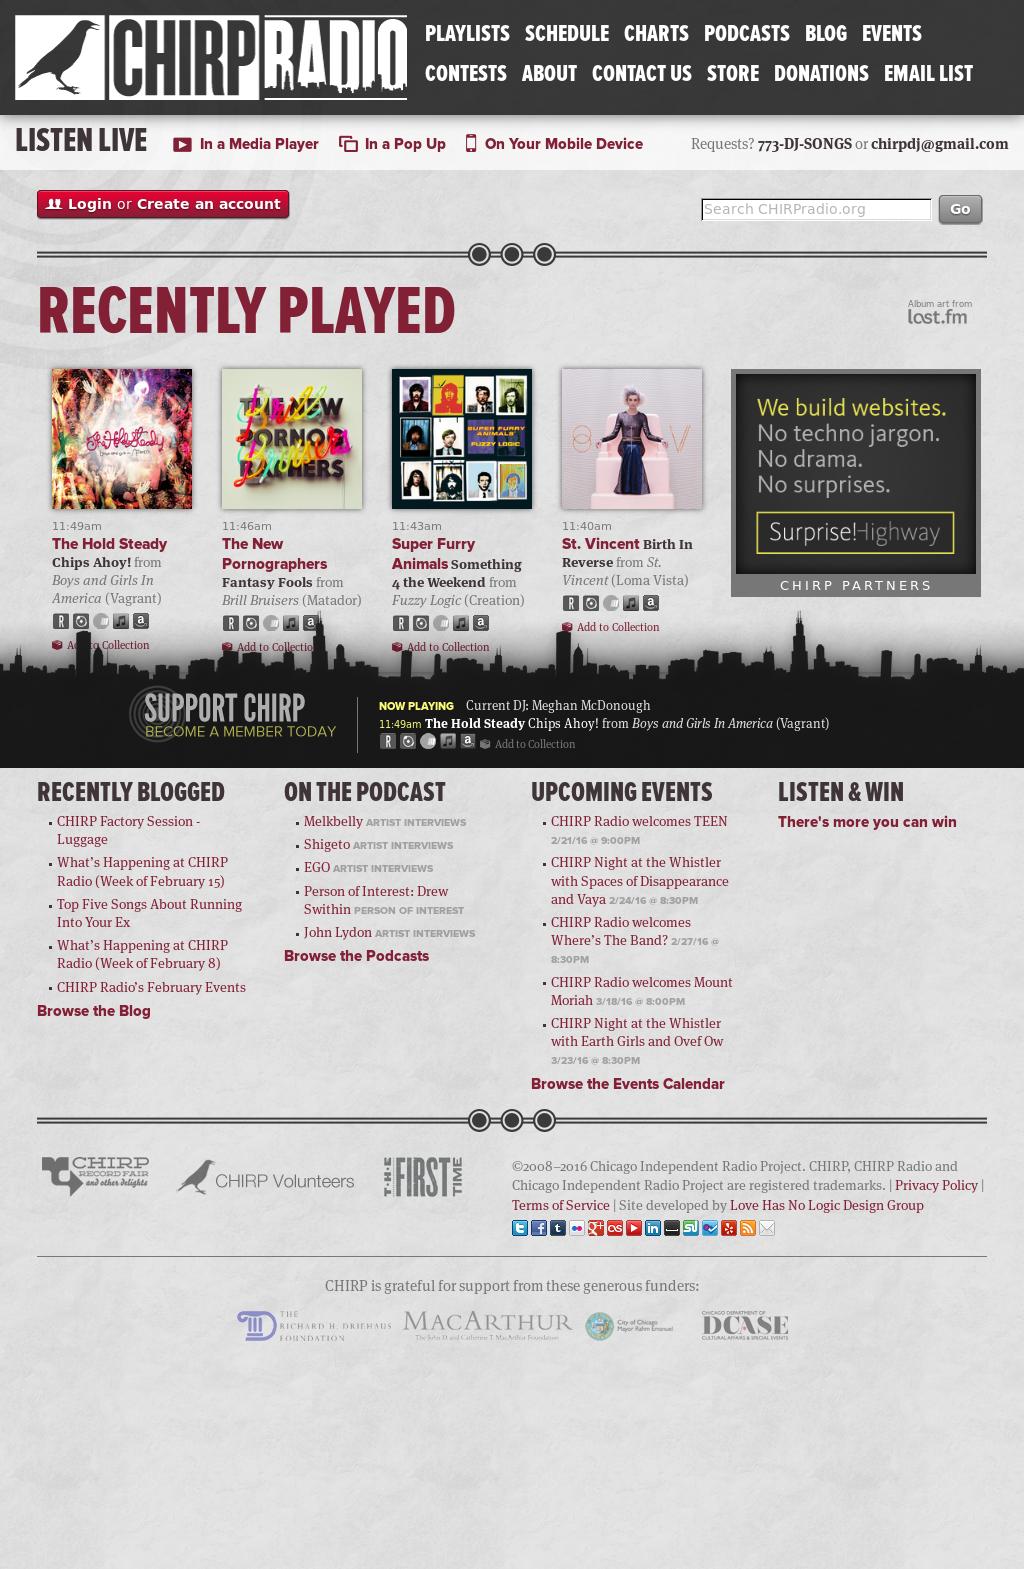 Chirpradio Competitors, Revenue and Employees - Owler